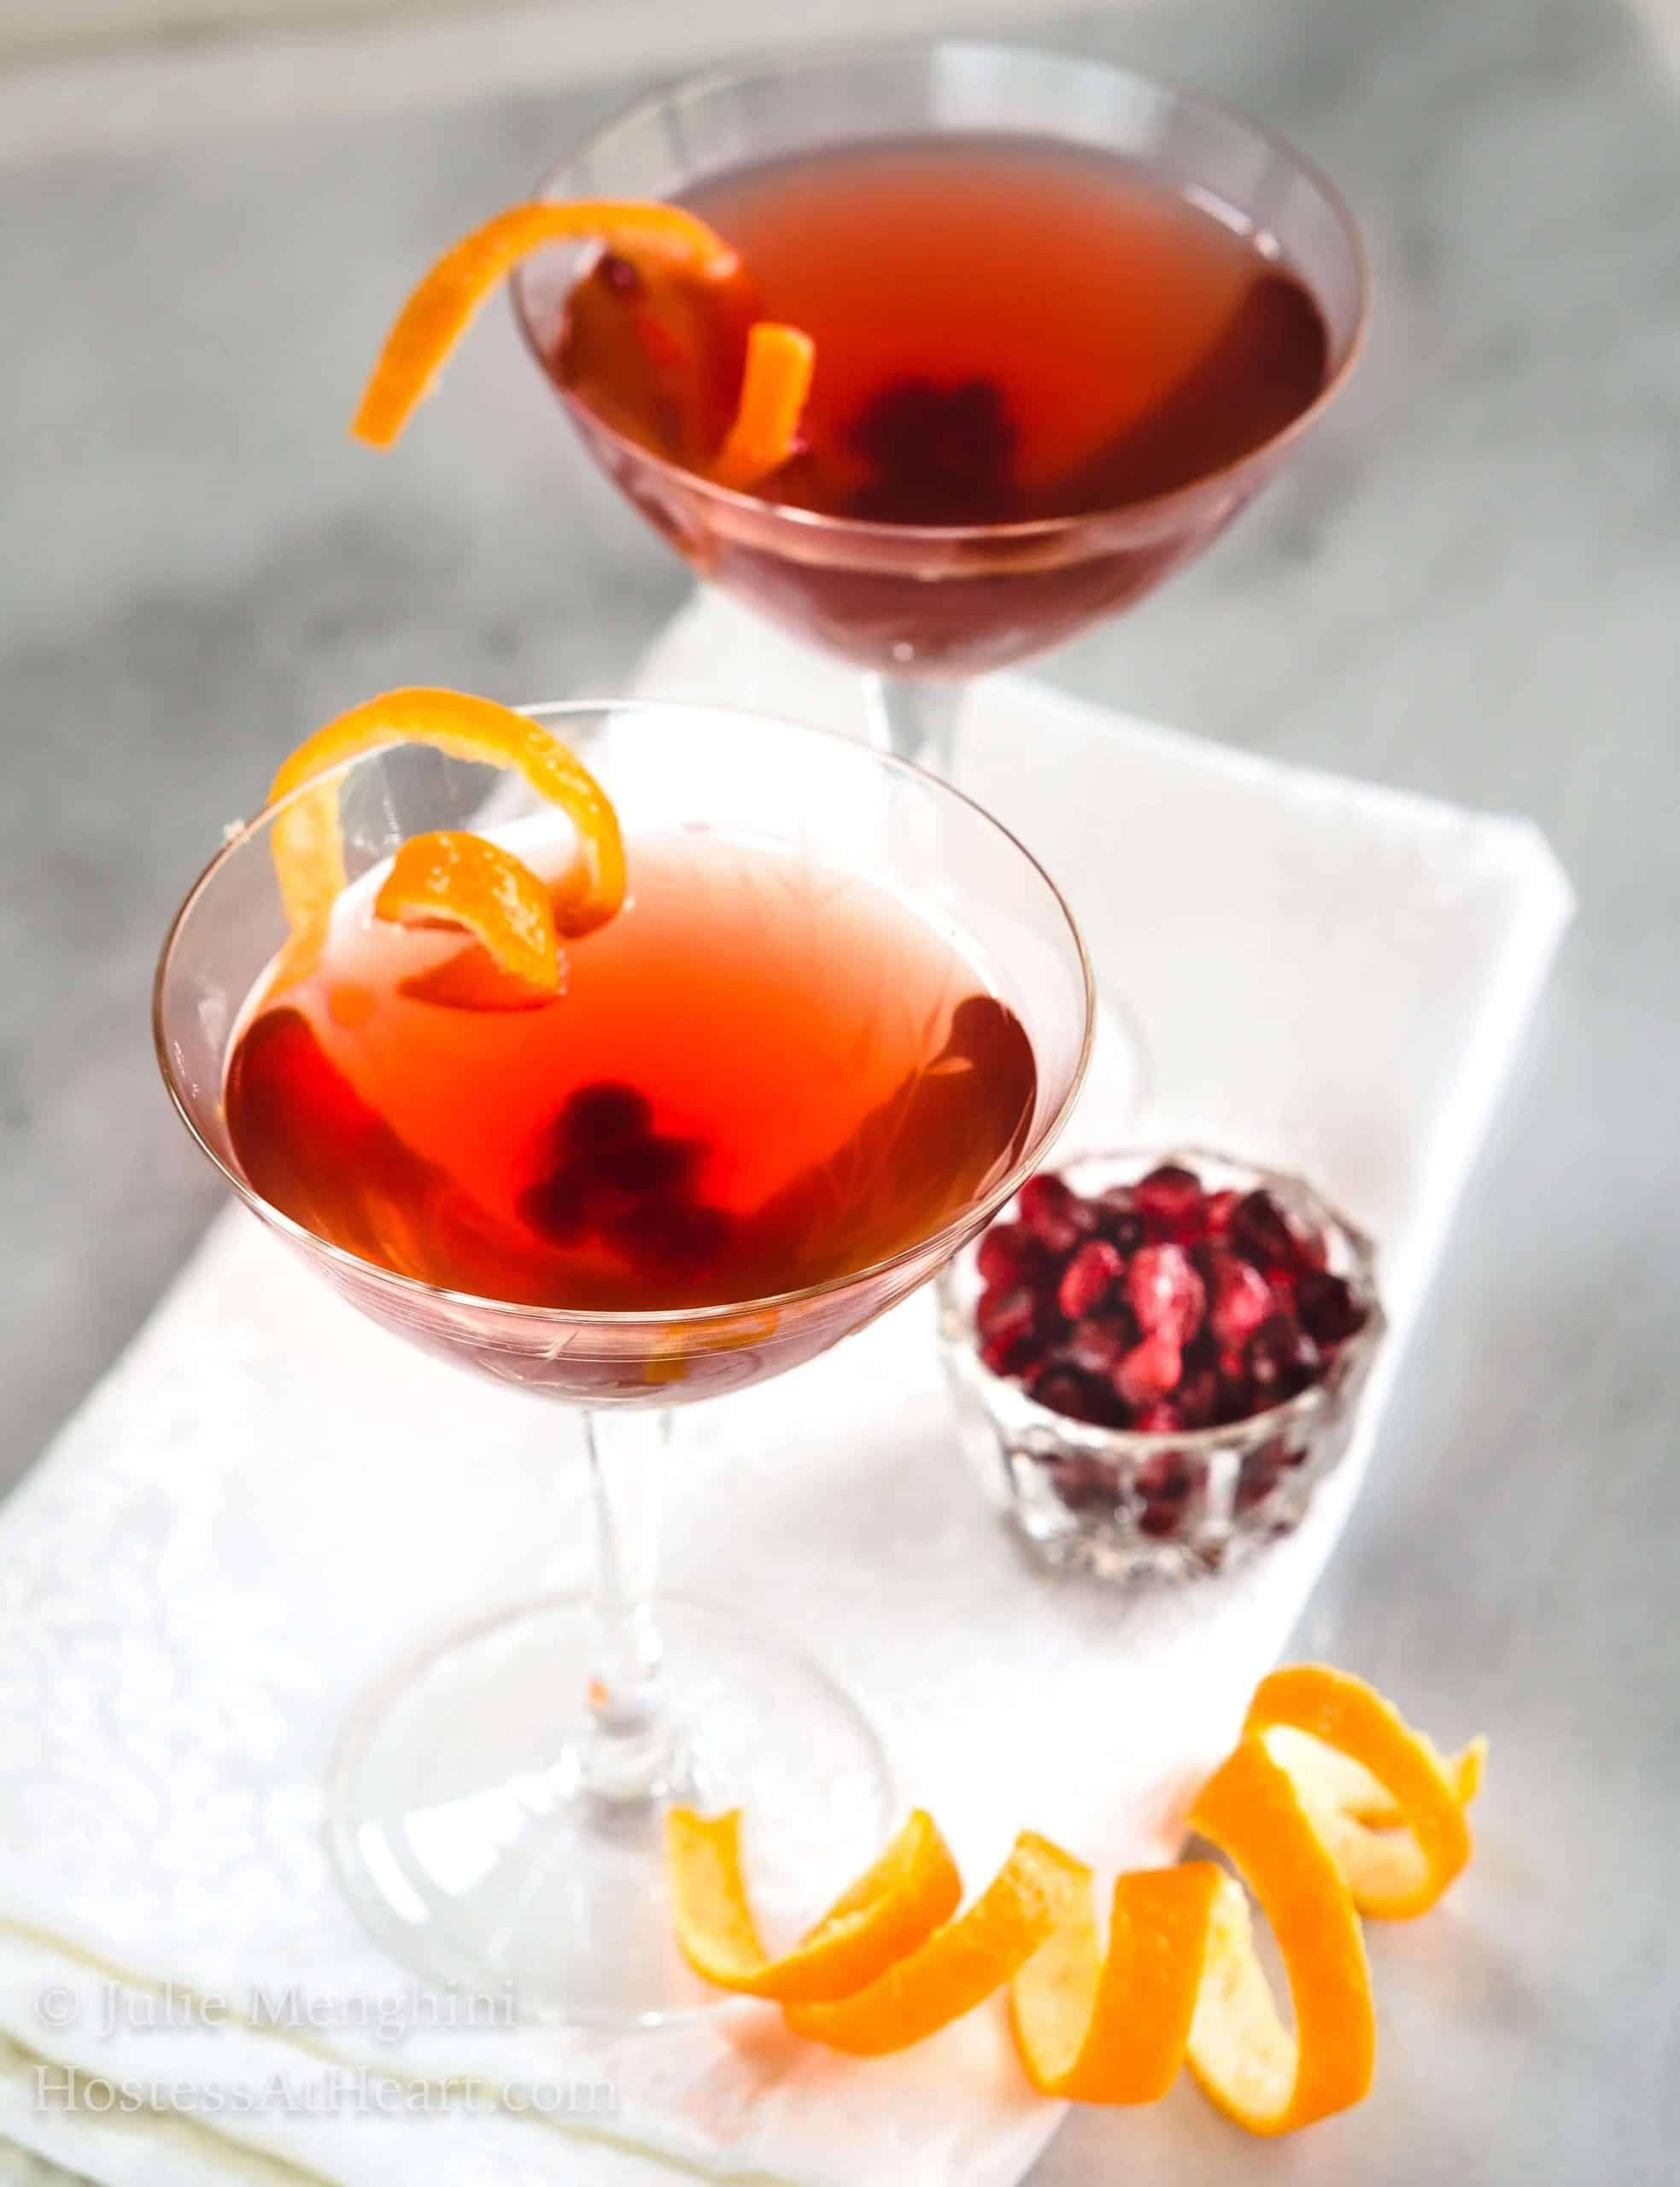 Easy Pomegranate Clementine Vodka Cocktail